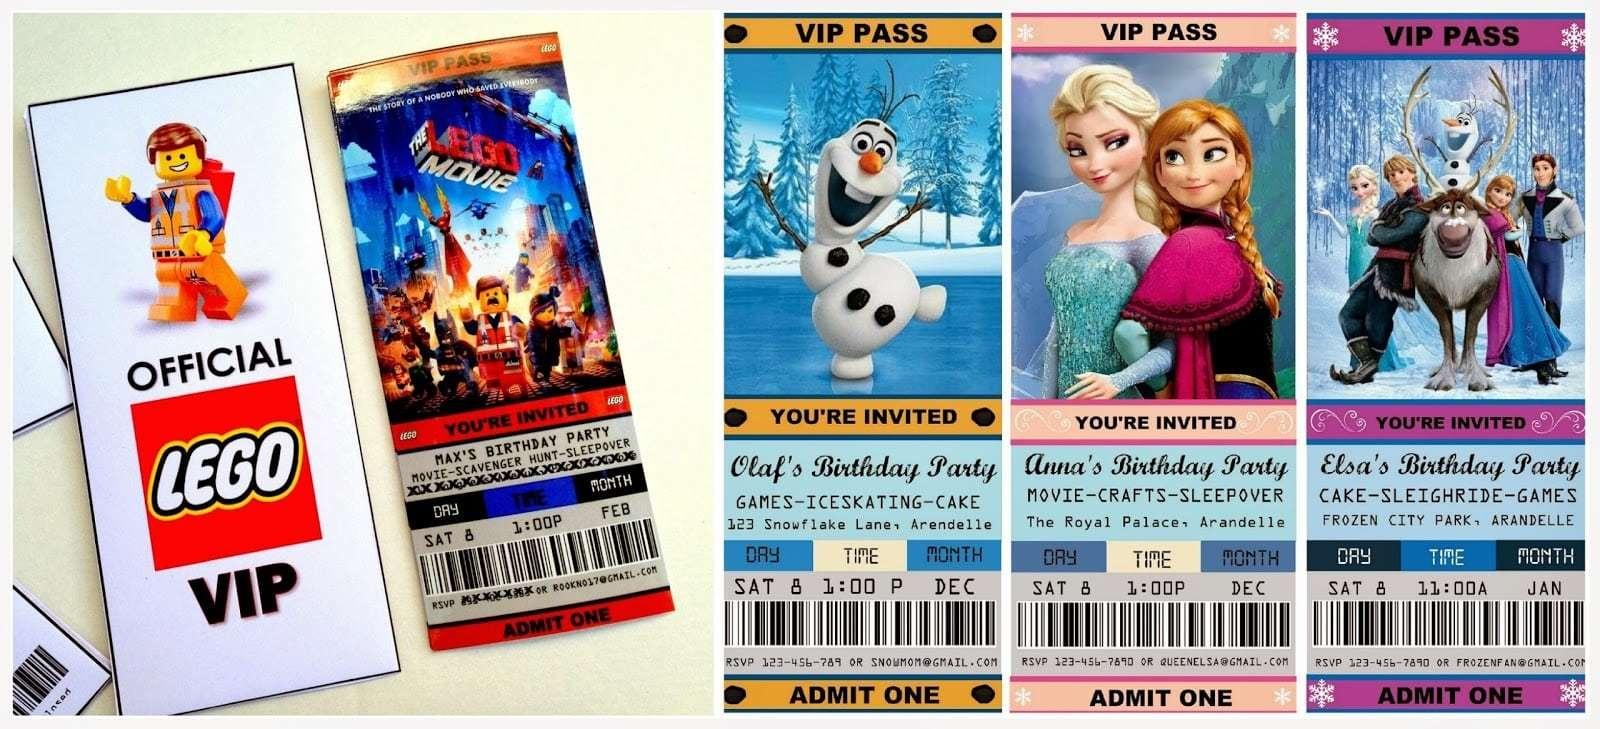 Movie Birthday Invitation Templates. Frozen Movie Ticket Birthday - Free Printable Movie Ticket Birthday Party Invitations